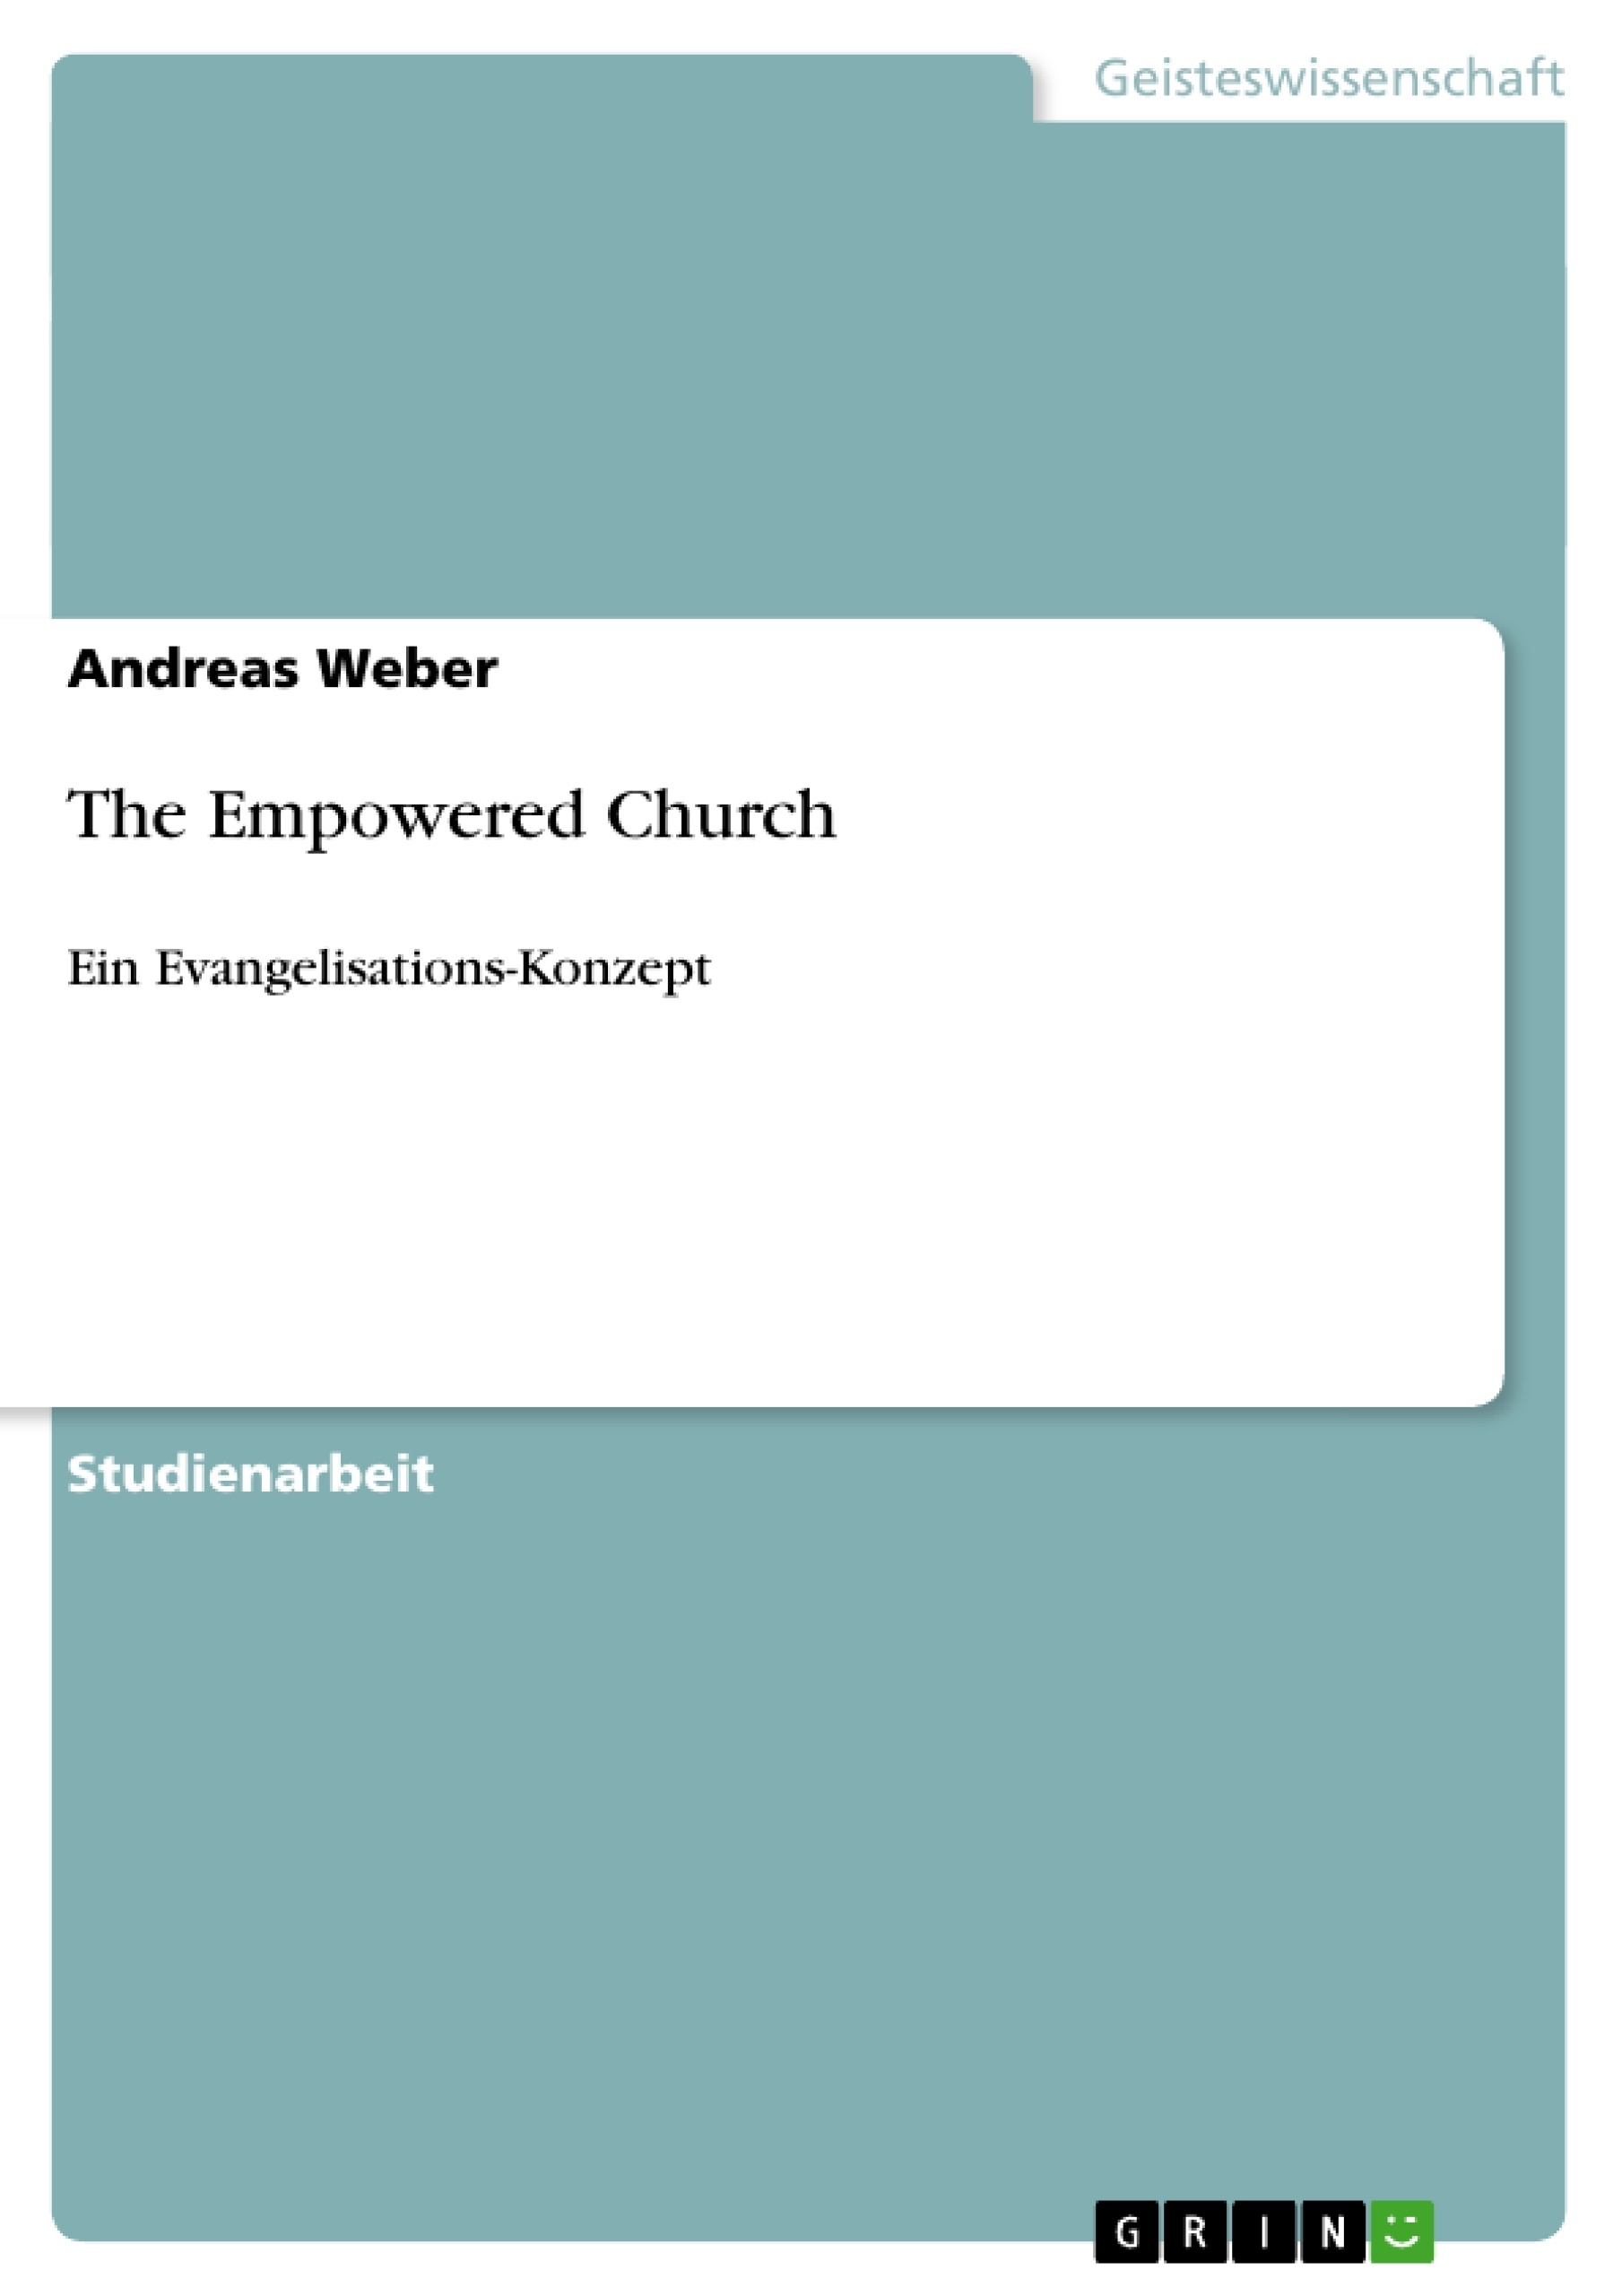 Titel:  The Empowered Church